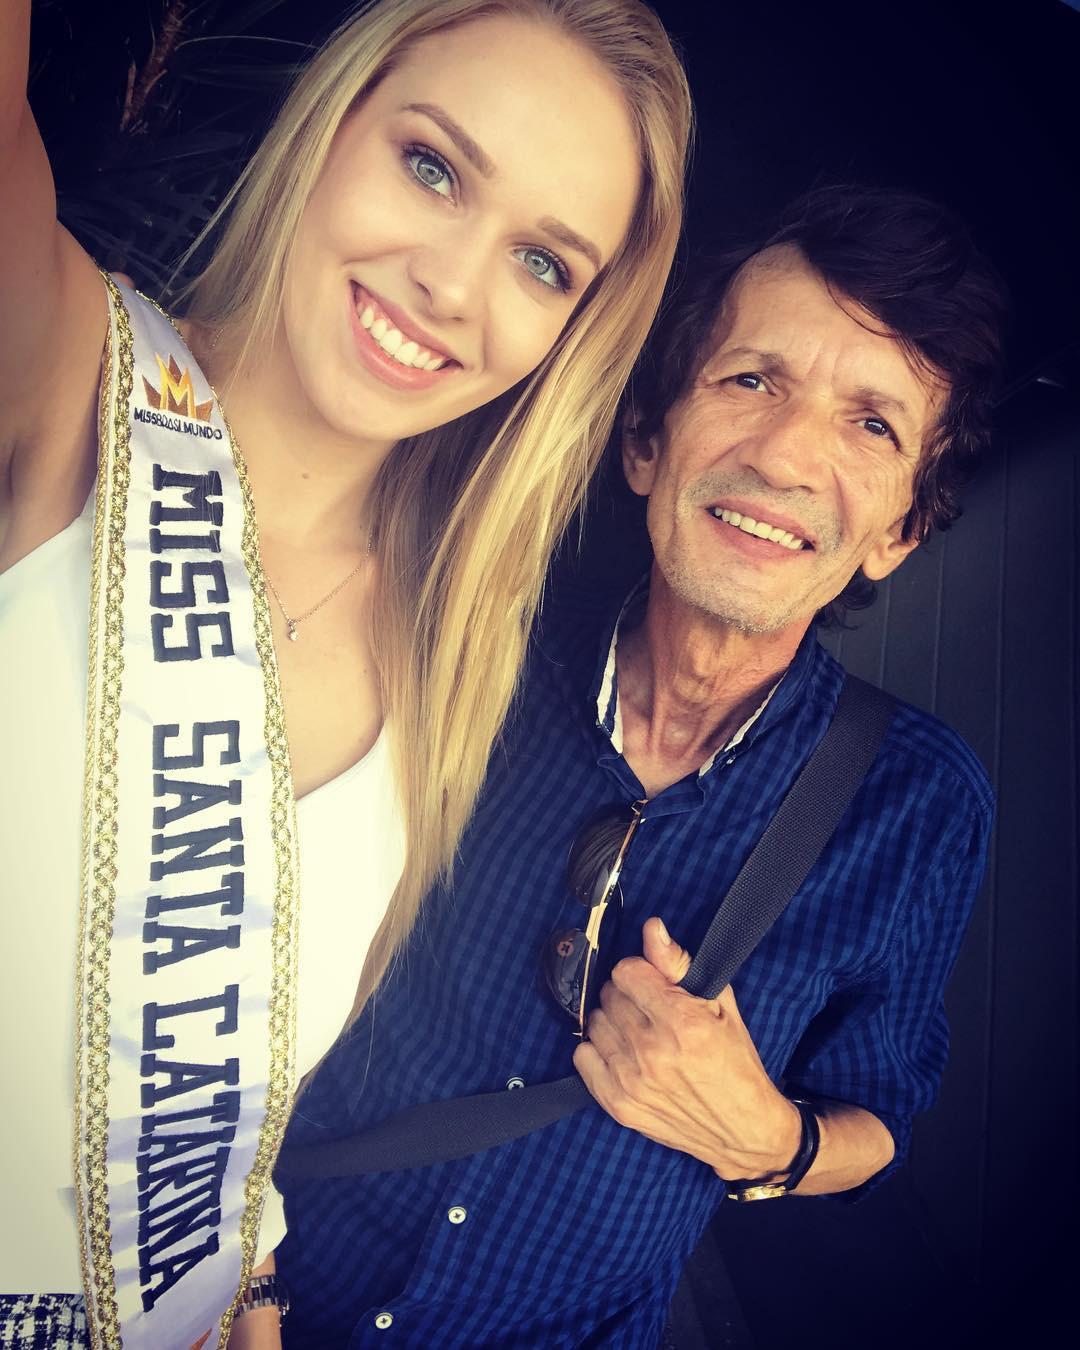 elizama aguilar, top 5 de miss brasil mundo 2019. - Página 5 Bd3aog10